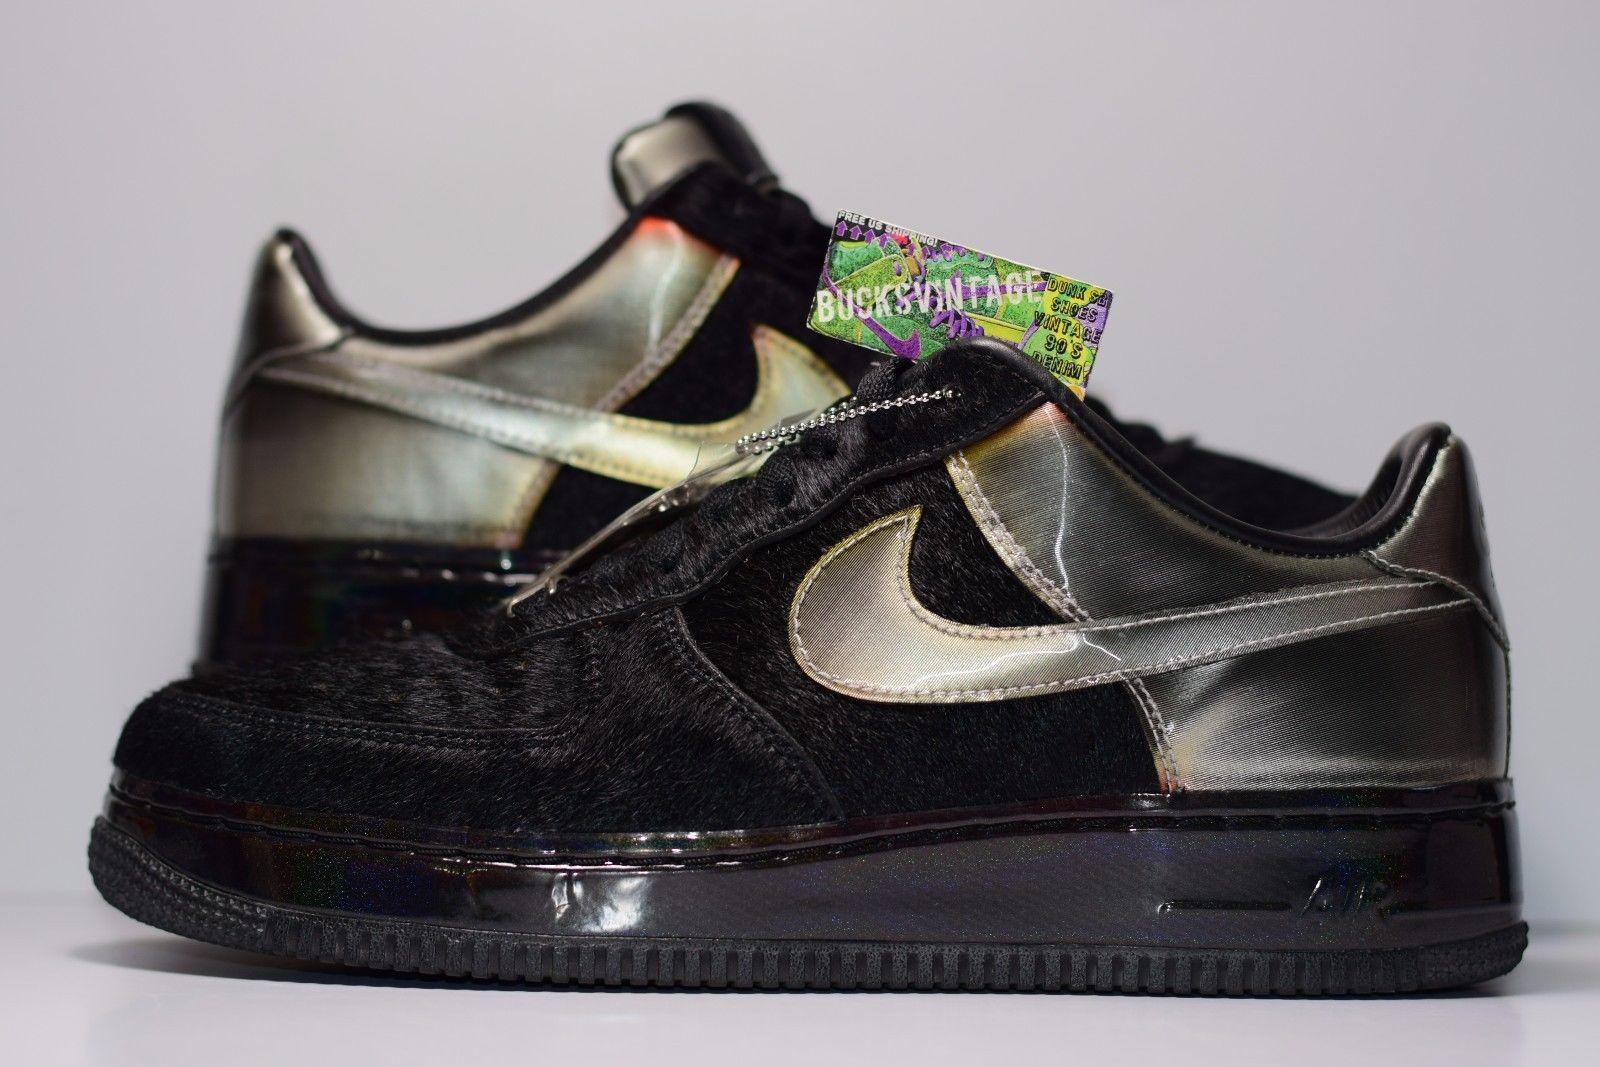 Force 001 Dj Size 82008 Kent 349703 1 Friday Nike Air Clark Supreme Black wmvN8ny0O